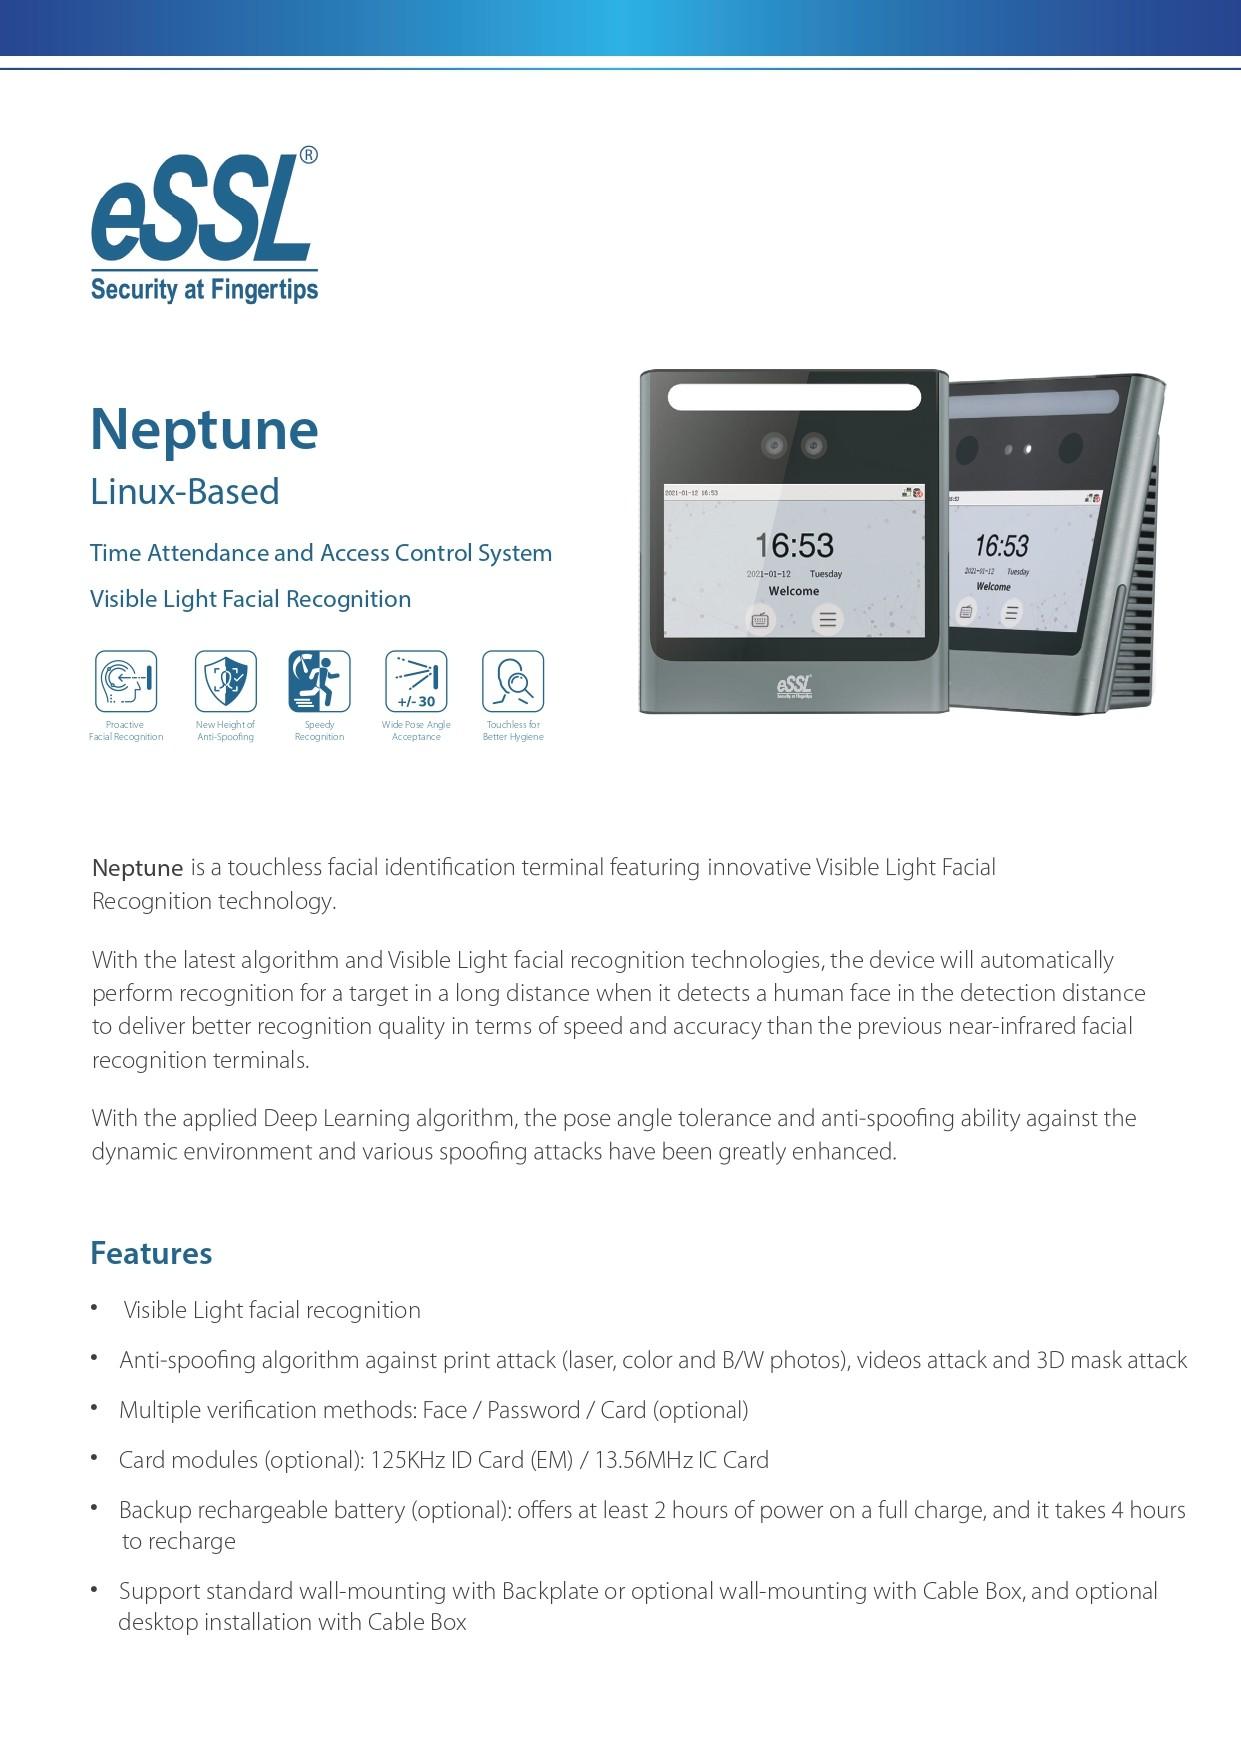 eSSL AIface Neptune Face Attendance System